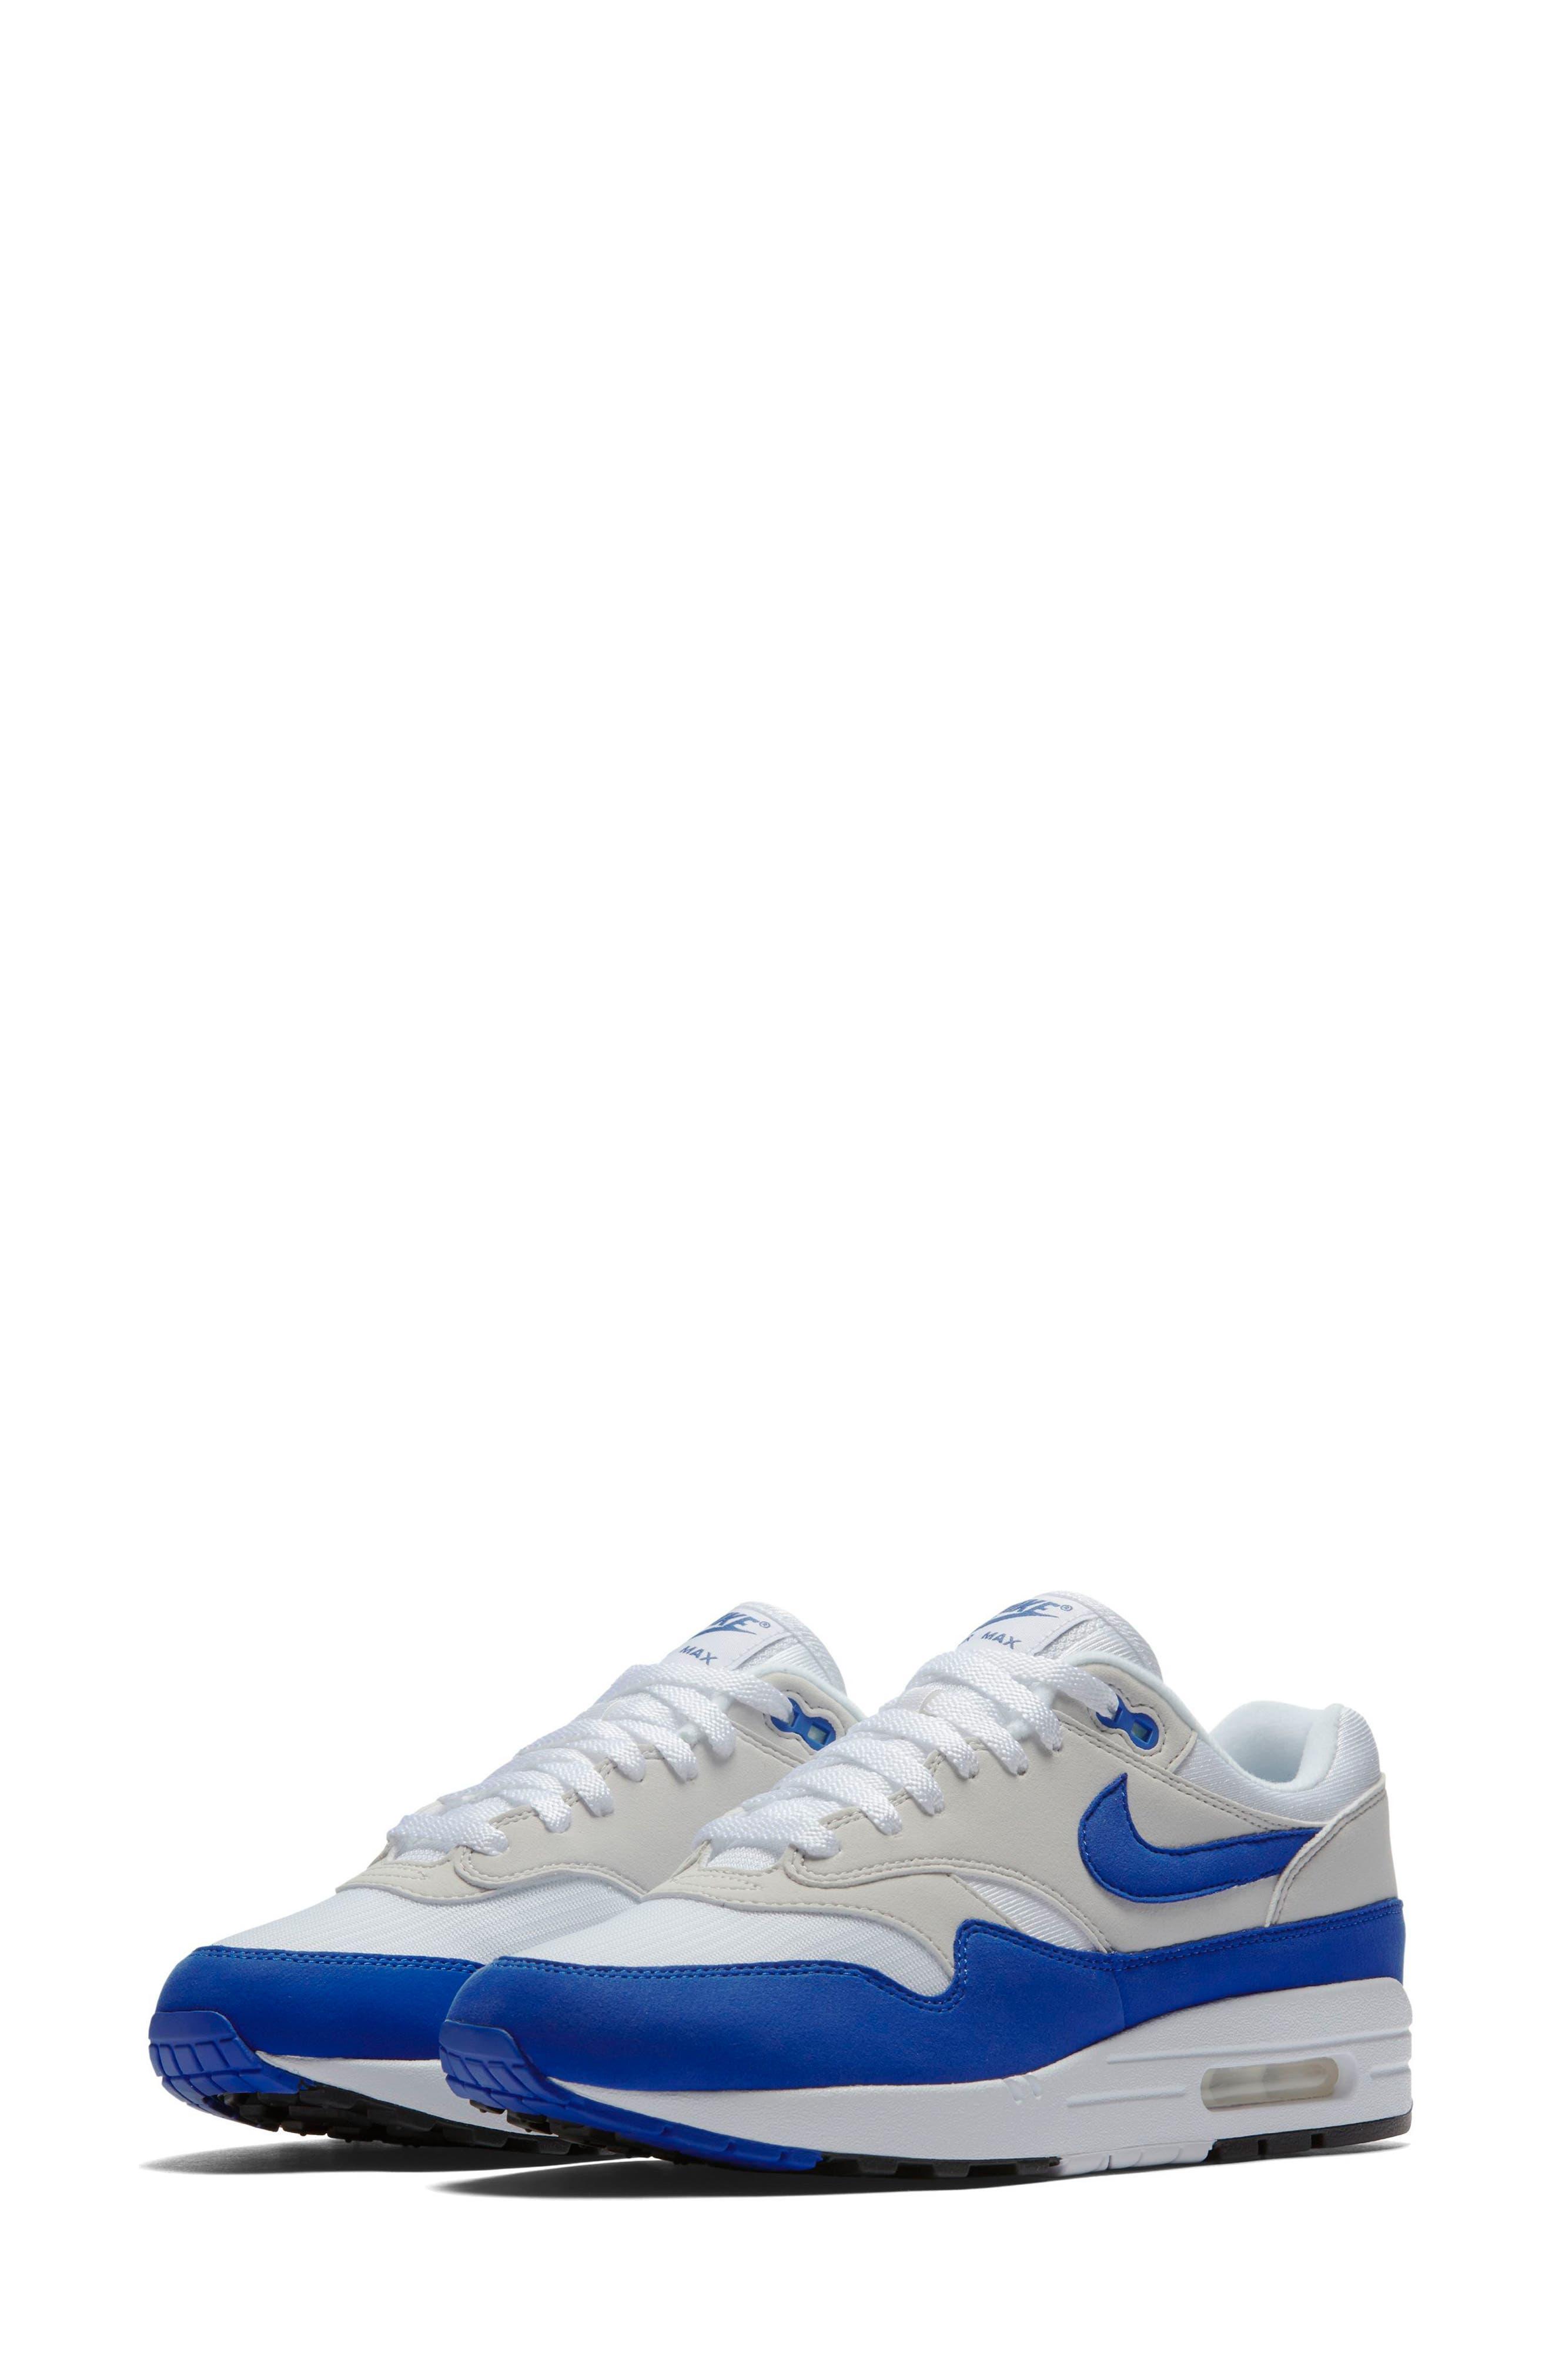 Air Max 1 Anniversary Sneaker,                             Main thumbnail 1, color,                             100